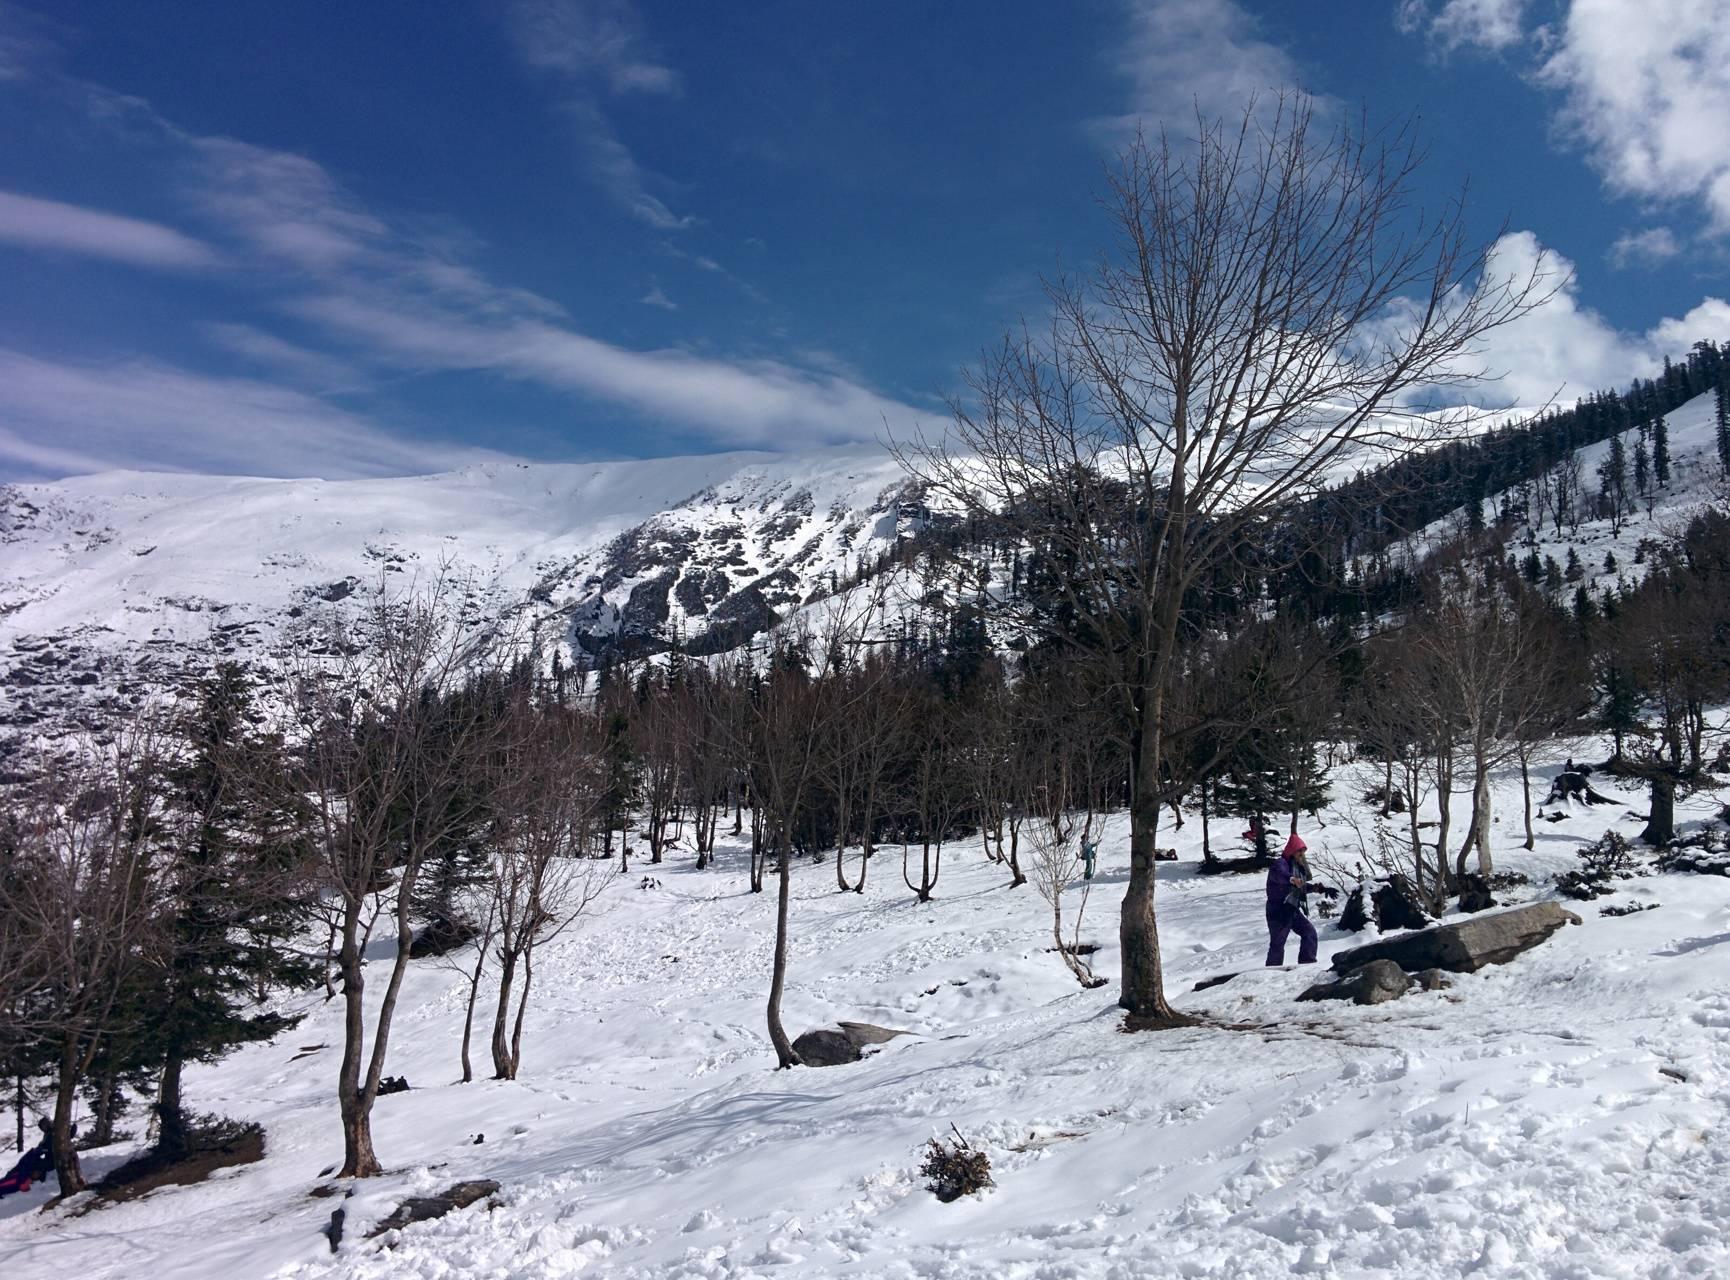 Snow manali